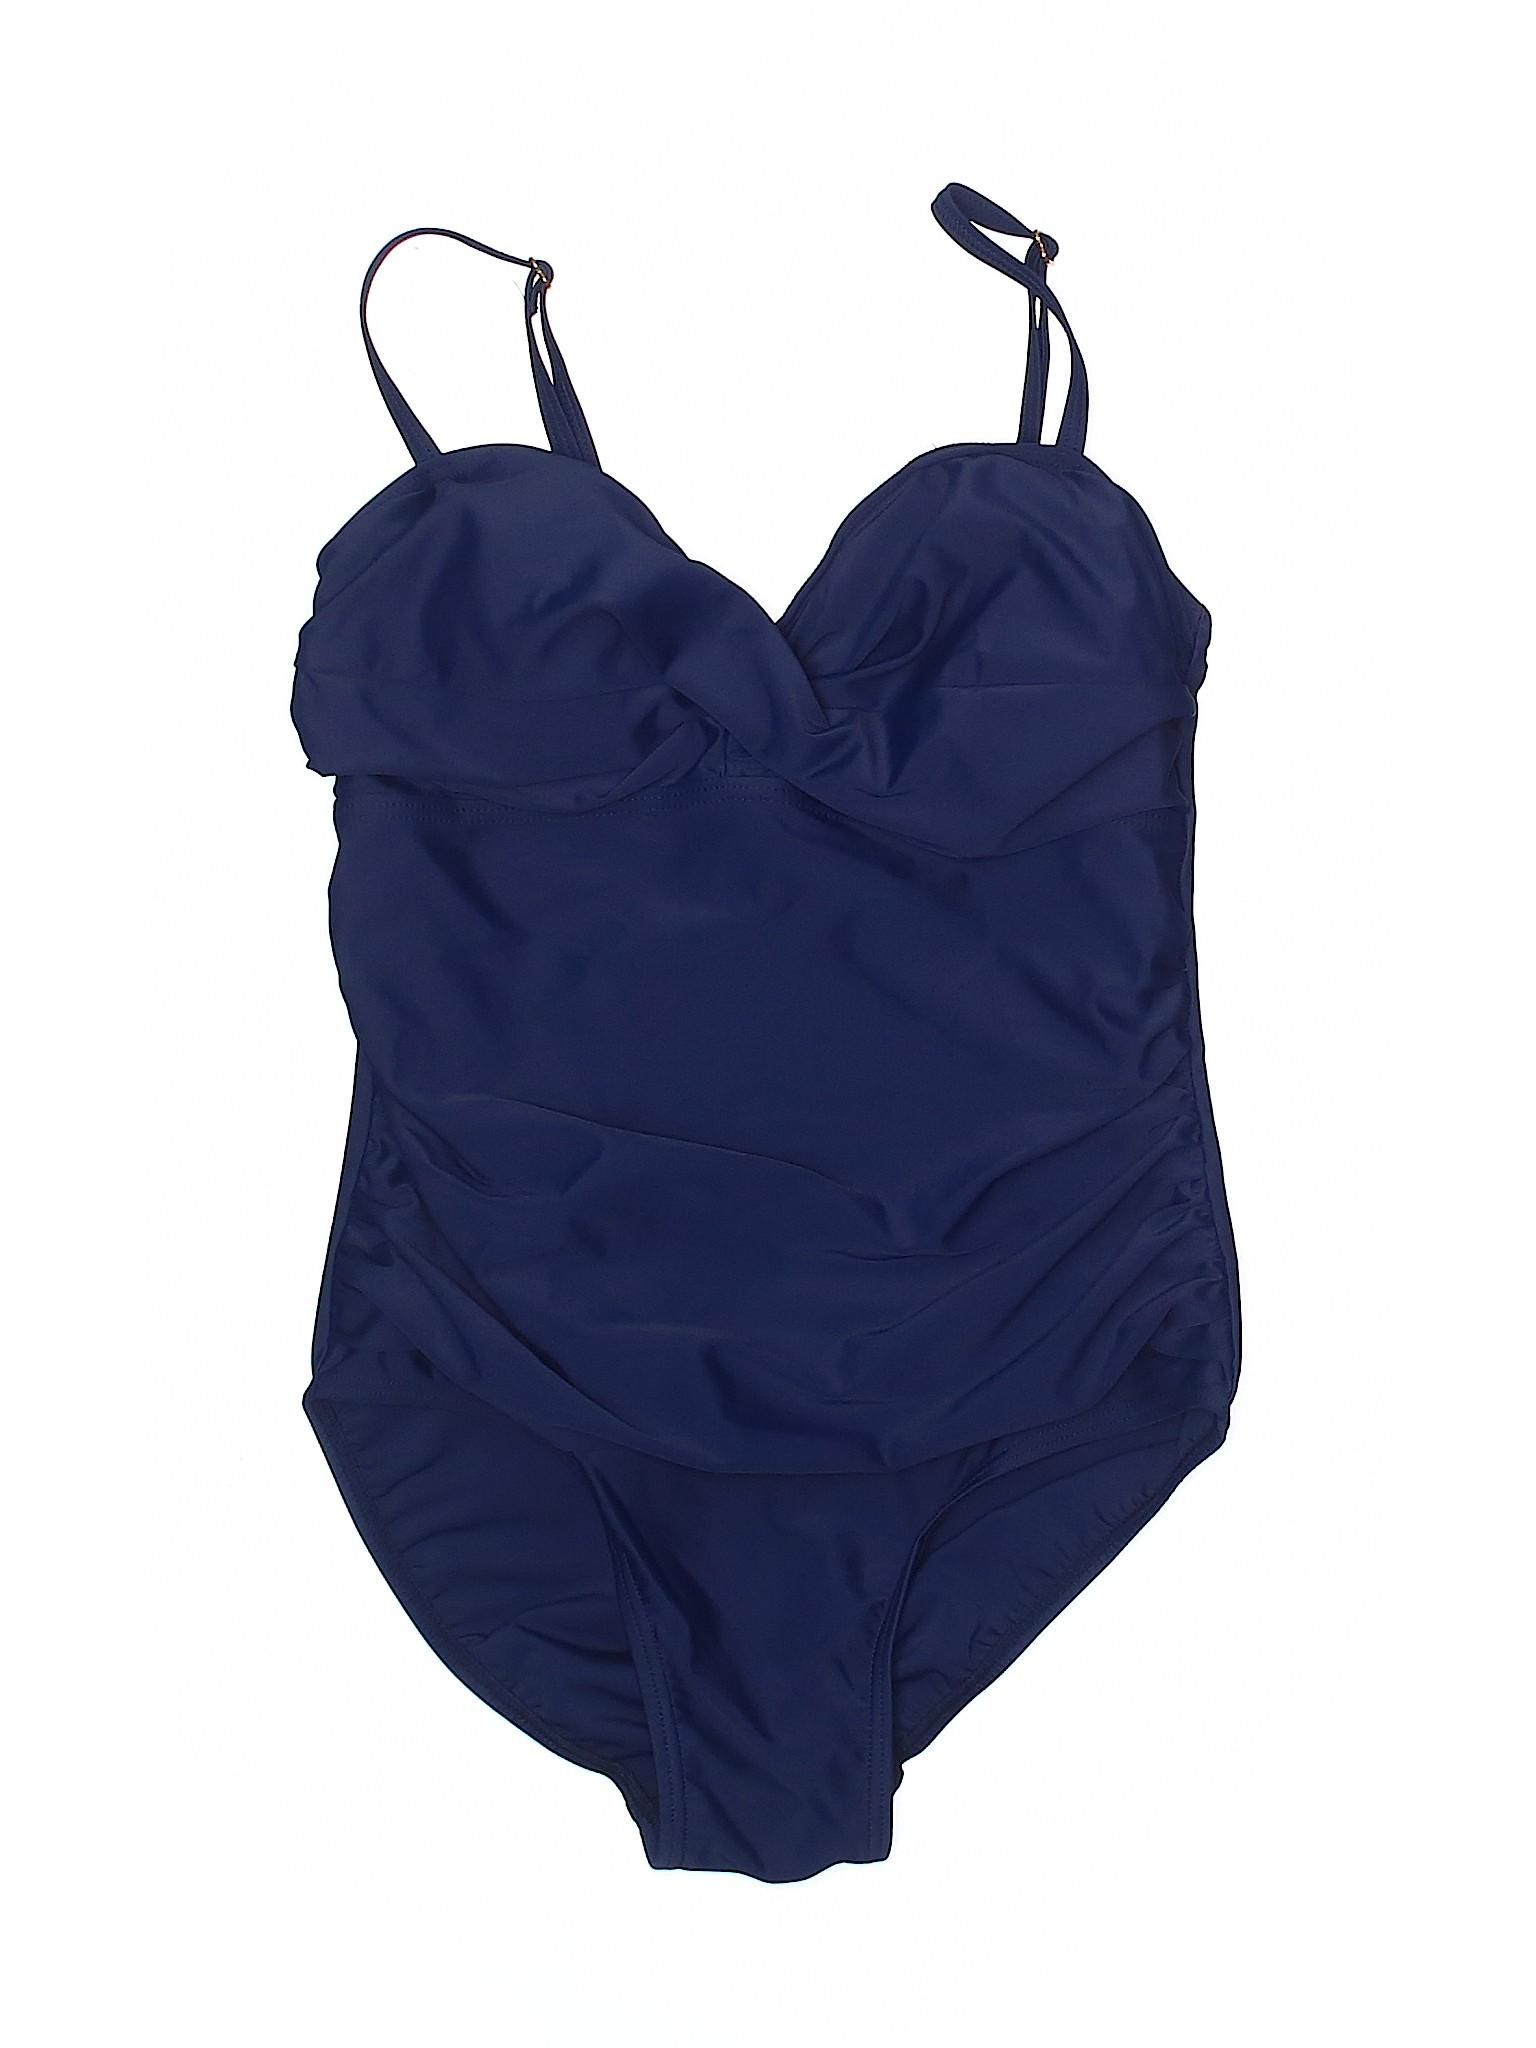 Shore Shapes Swimwear.